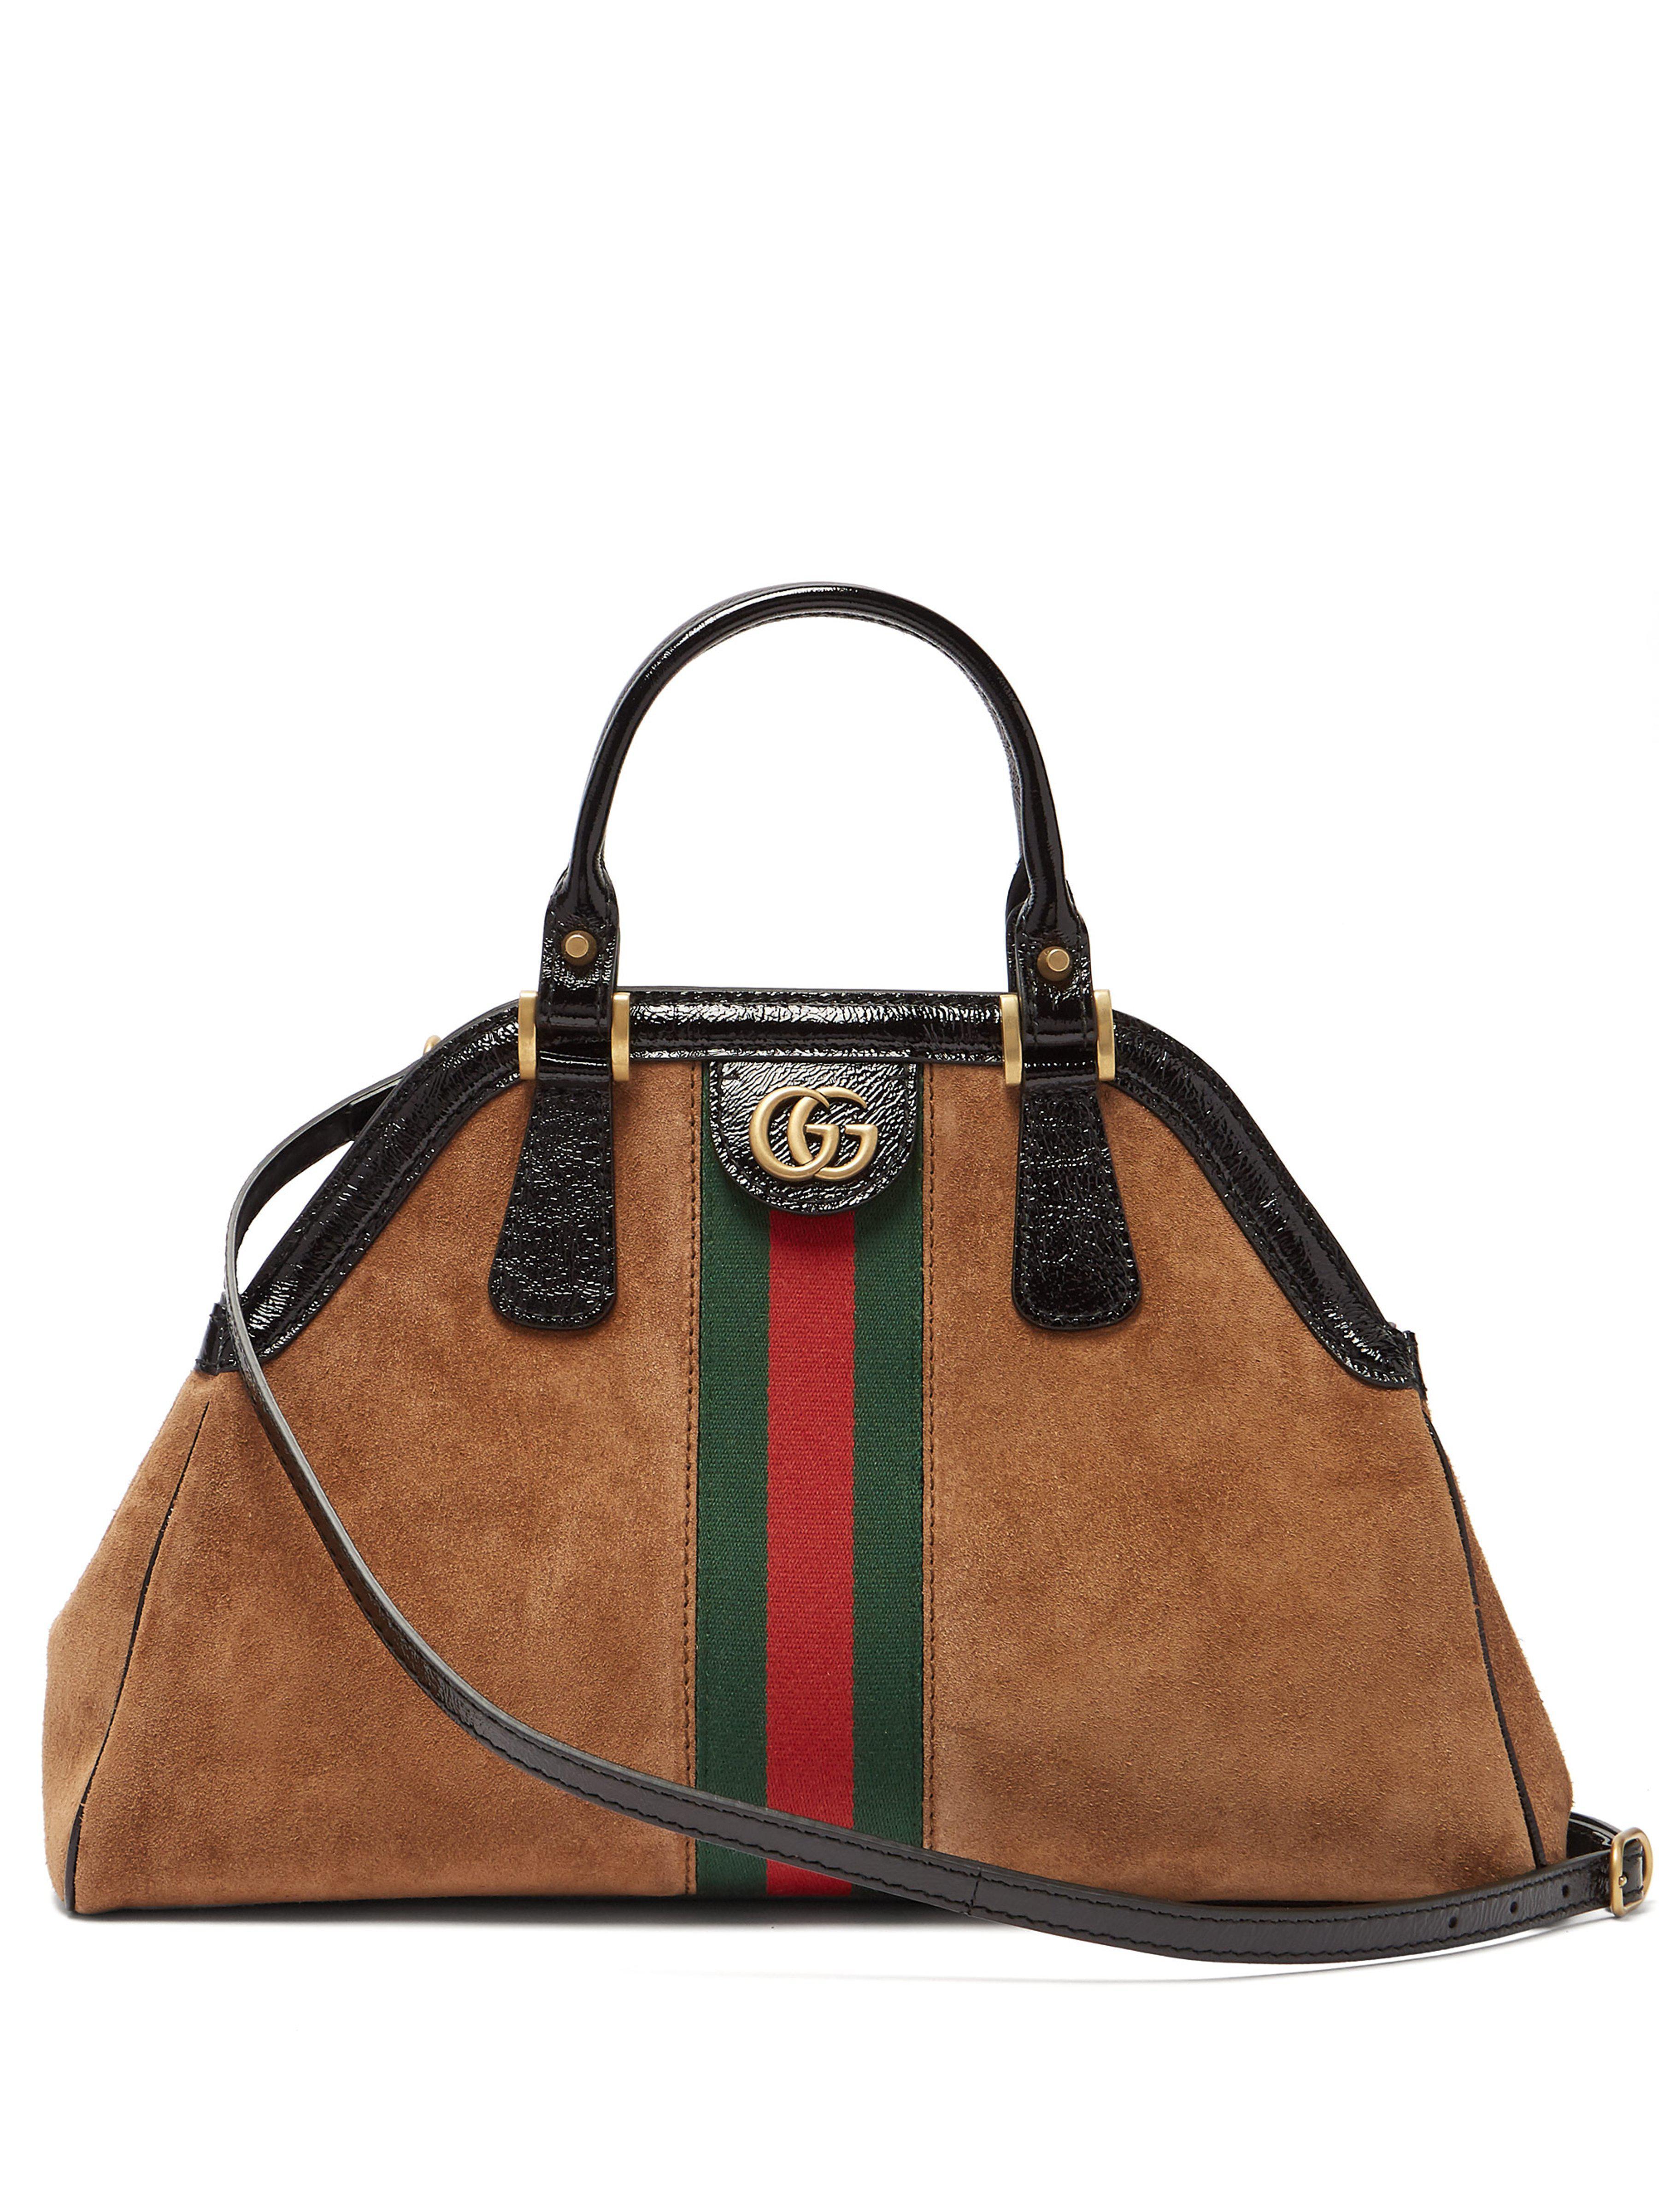 ec9a7567ad4 Gucci Re(belle) Web Stripe Suede Cross Body Bag in Brown - Save 7 ...